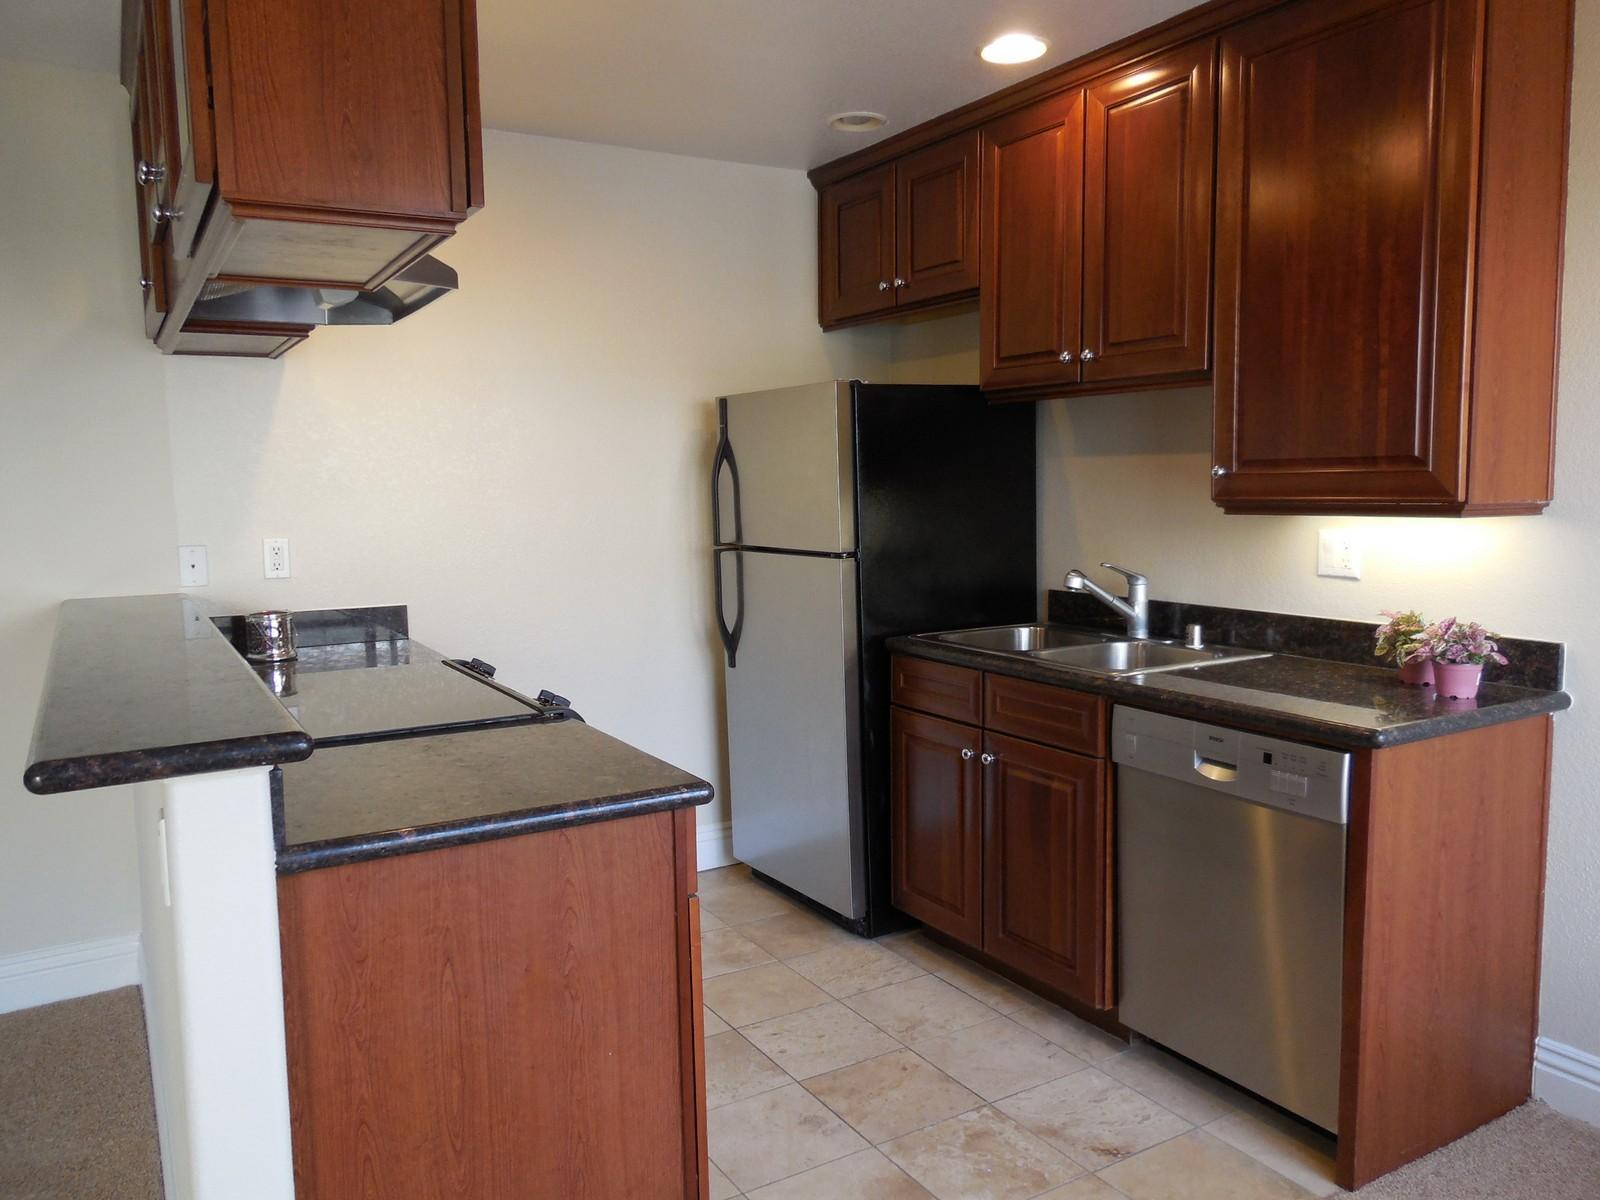 sales property at 3161 Via Alicante, Unit 233